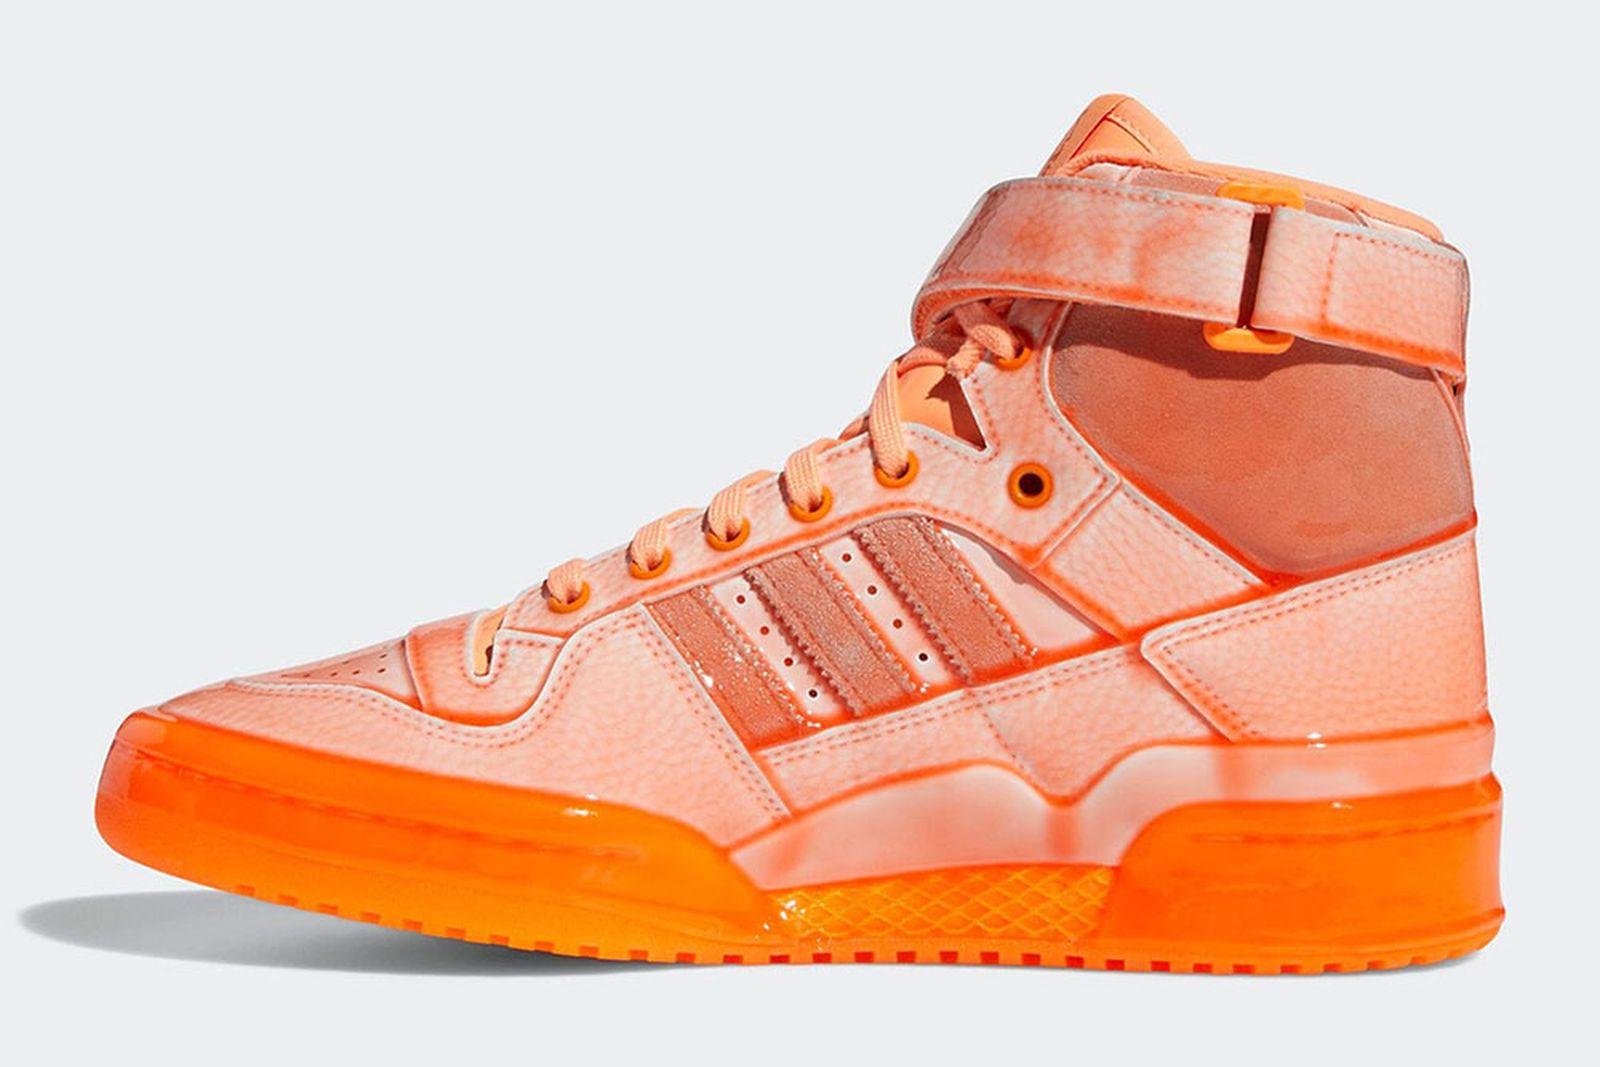 jeremy-scott-adidas-forum-hi-release-date-price-05